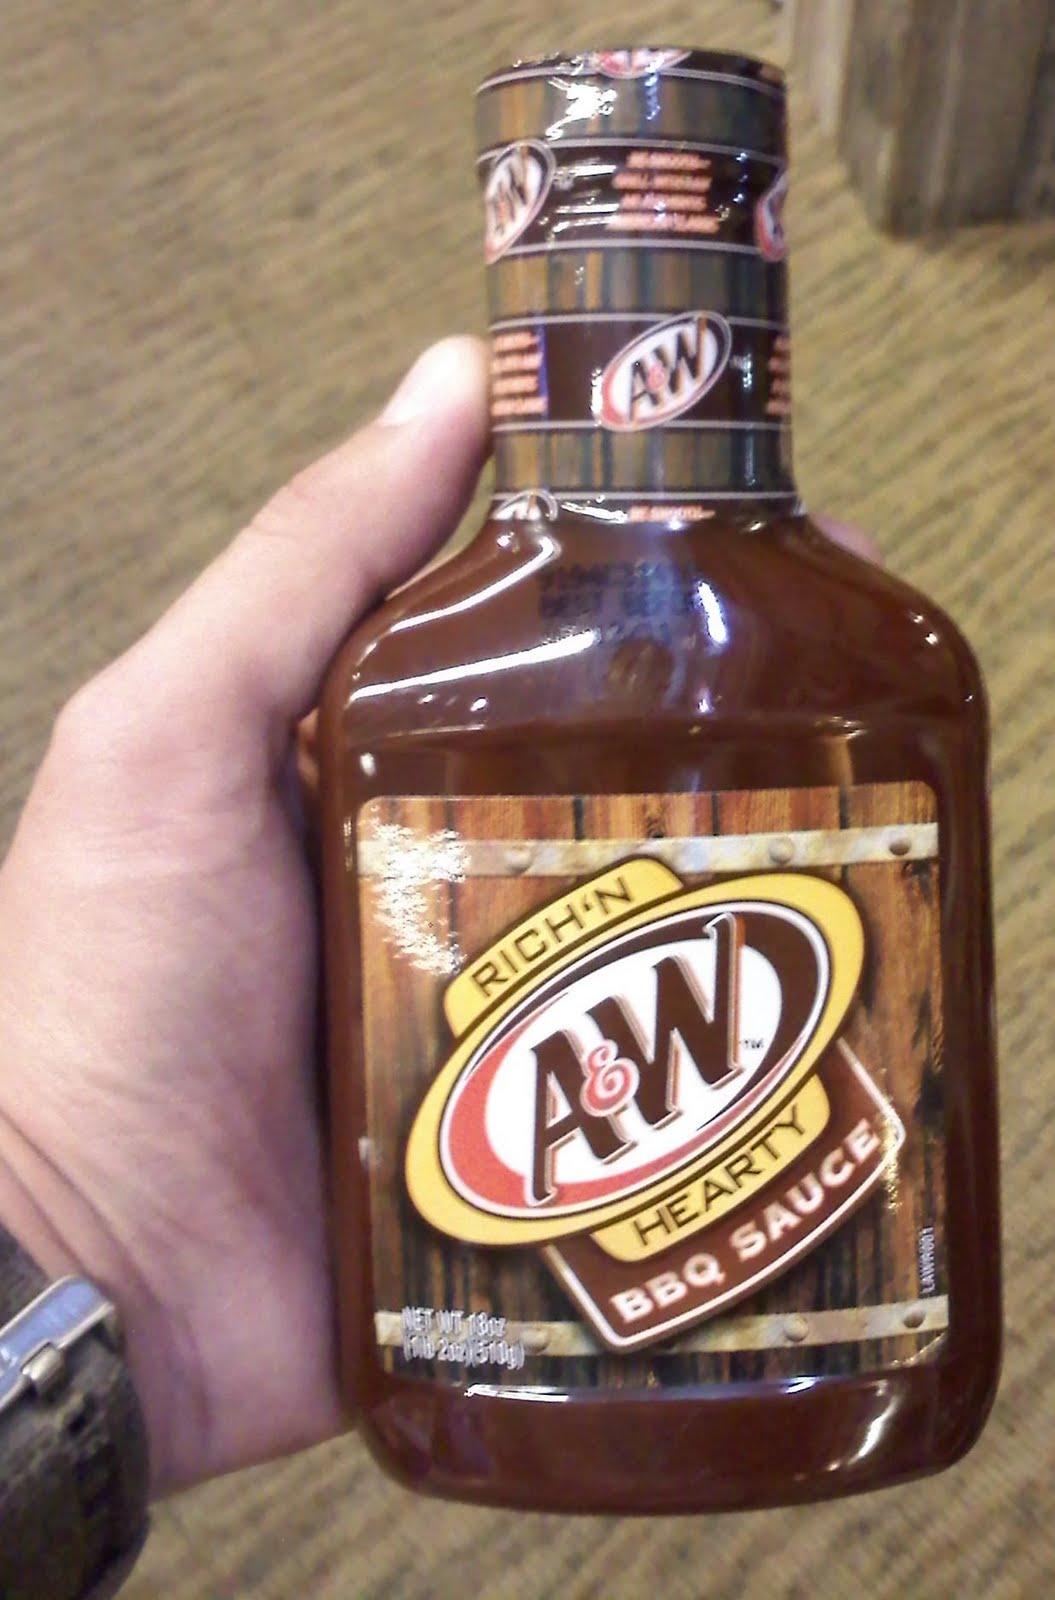 A&W+BBQ+sauce.jpg